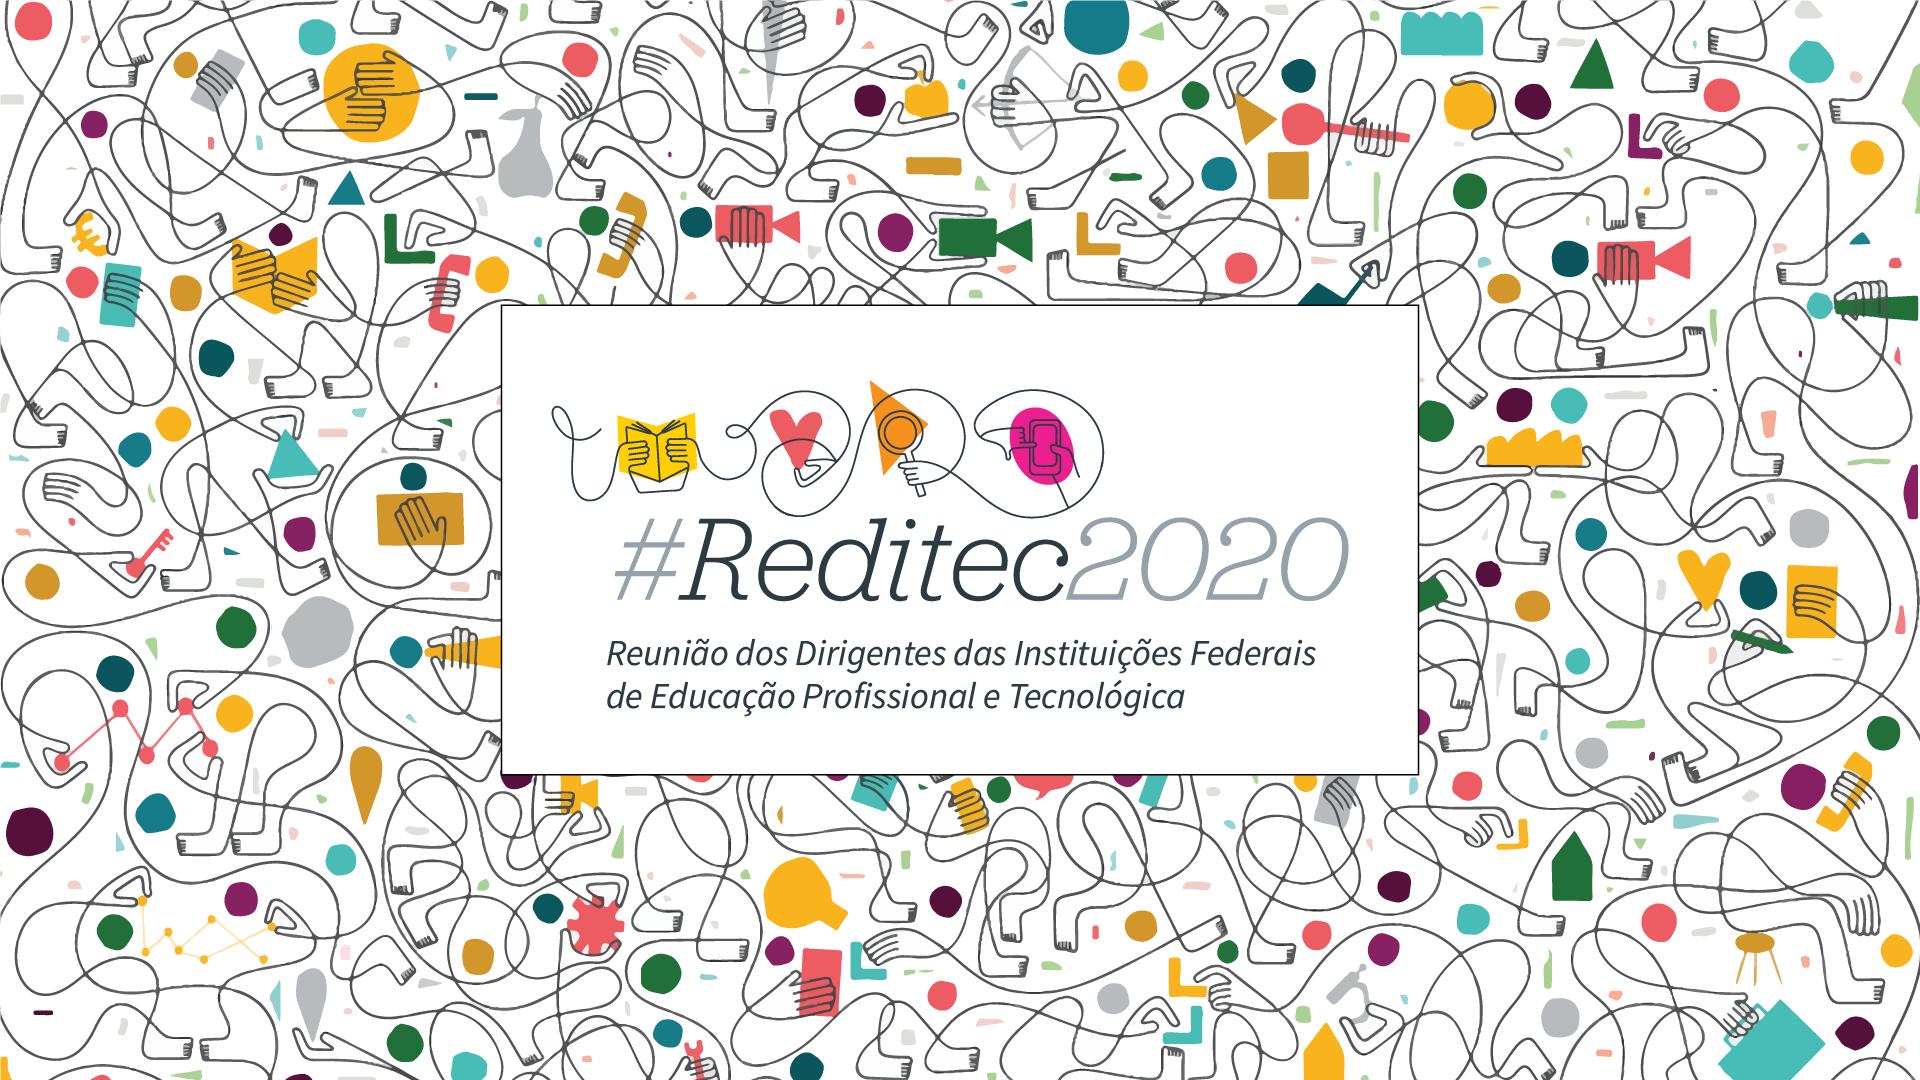 Carta da 44ª Reditec 2020